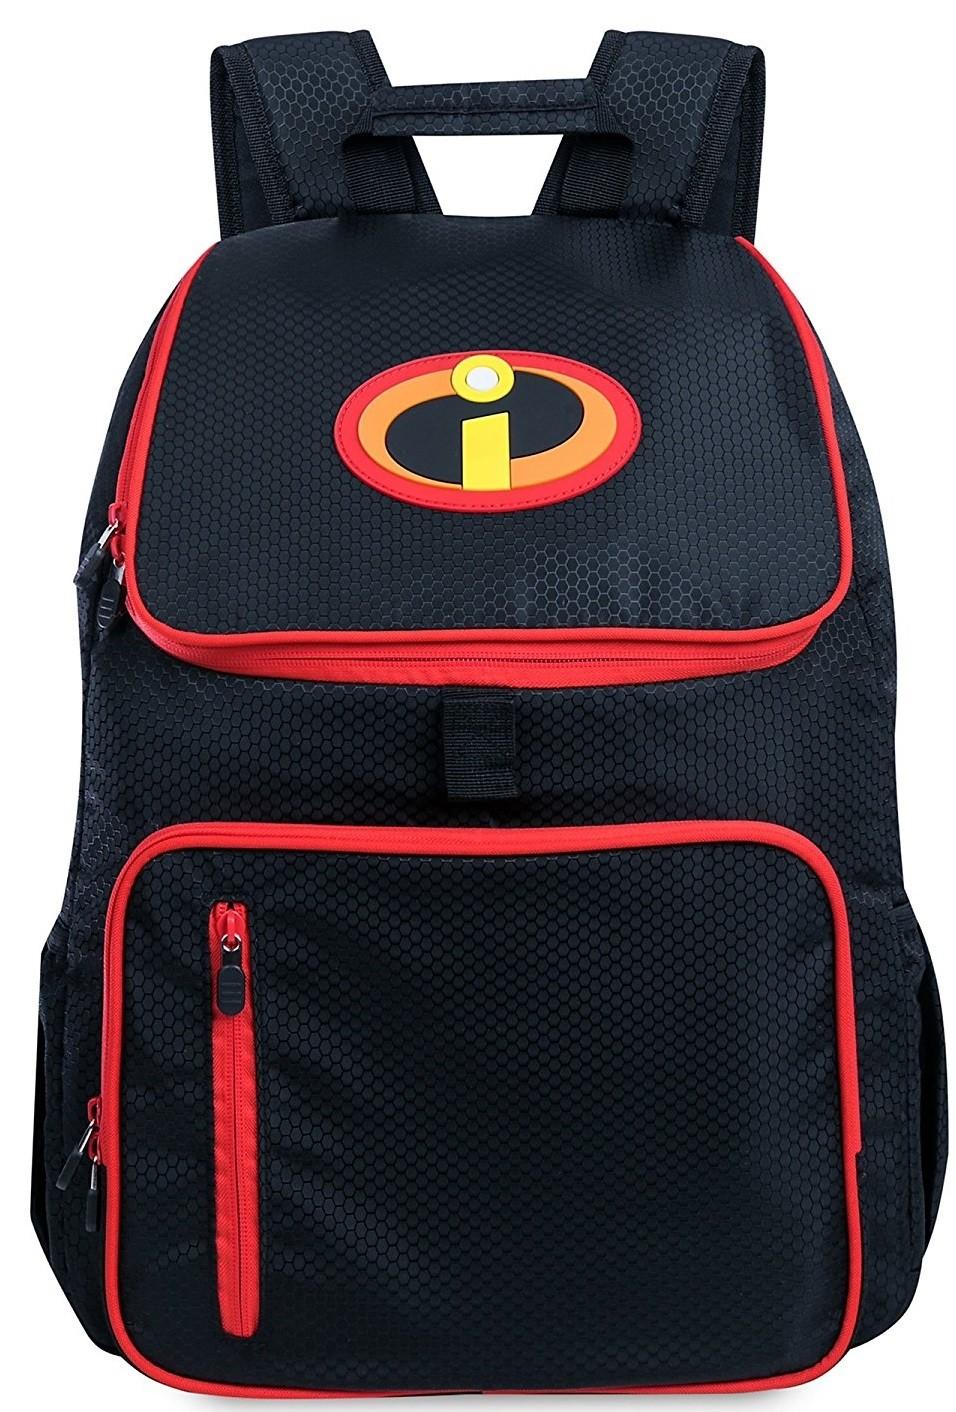 3d362b6d055 Incredibles Backpack